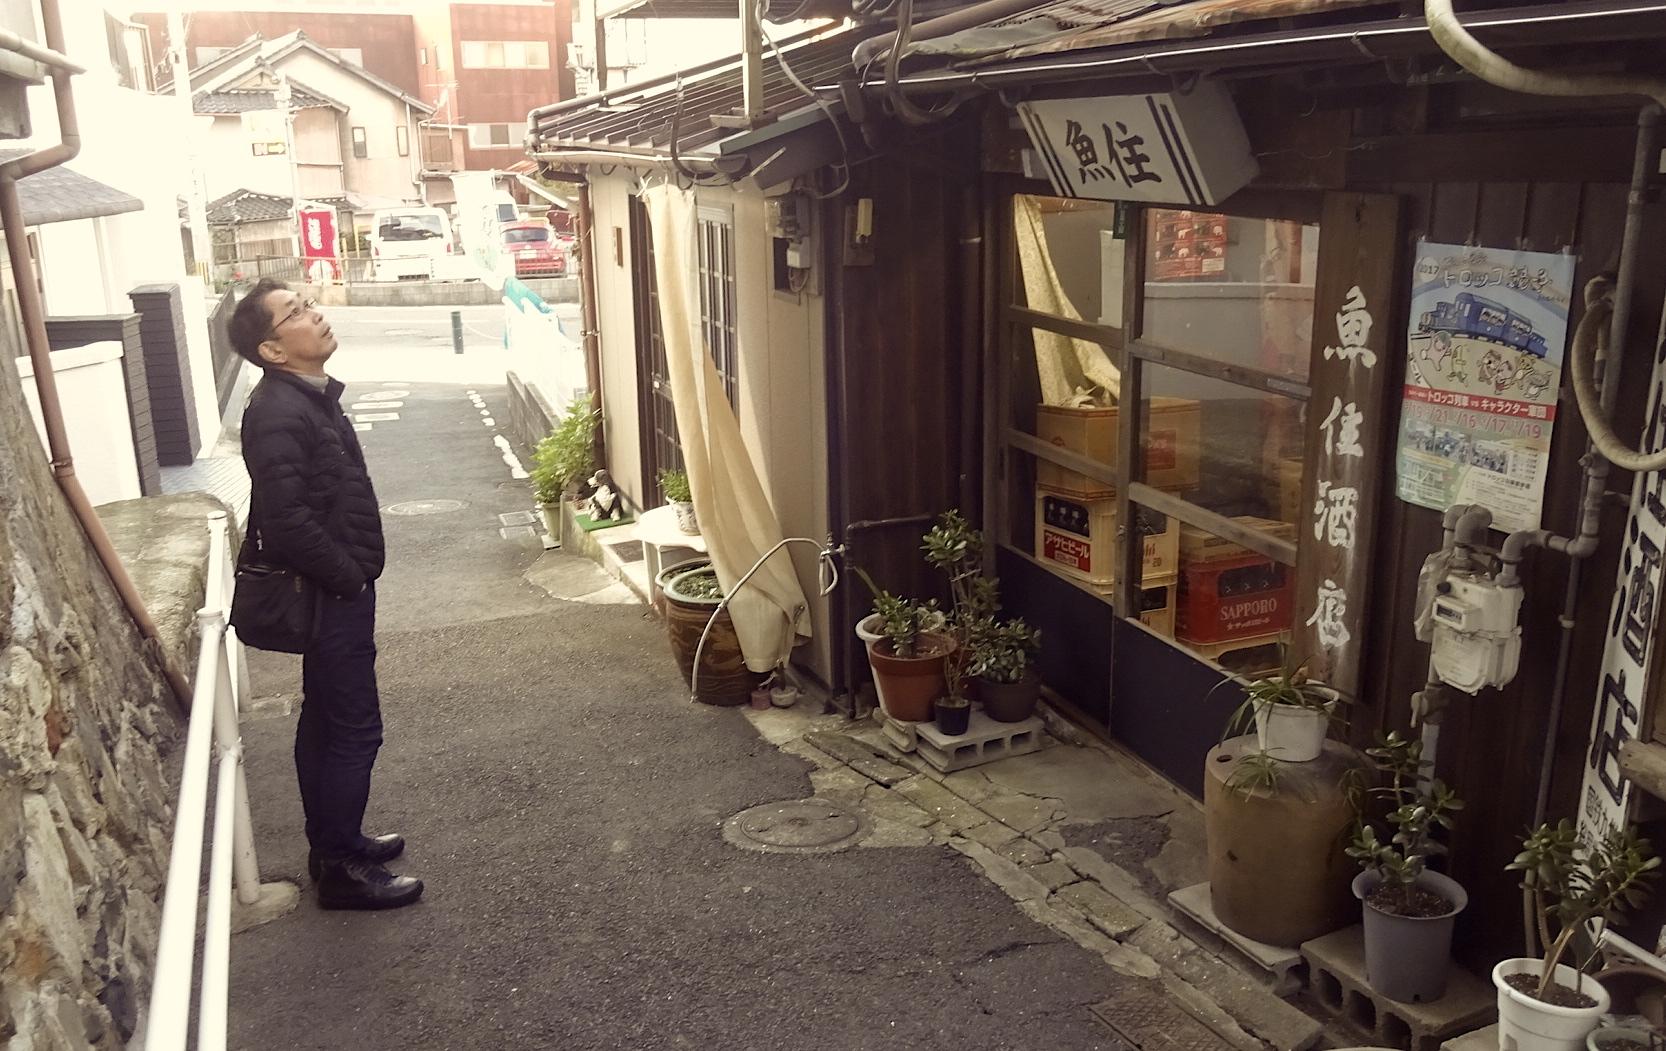 https://cdn-ak2.f.st-hatena.com/images/fotolife/s/shioshiohida/20171202/20171202160829_original.jpg